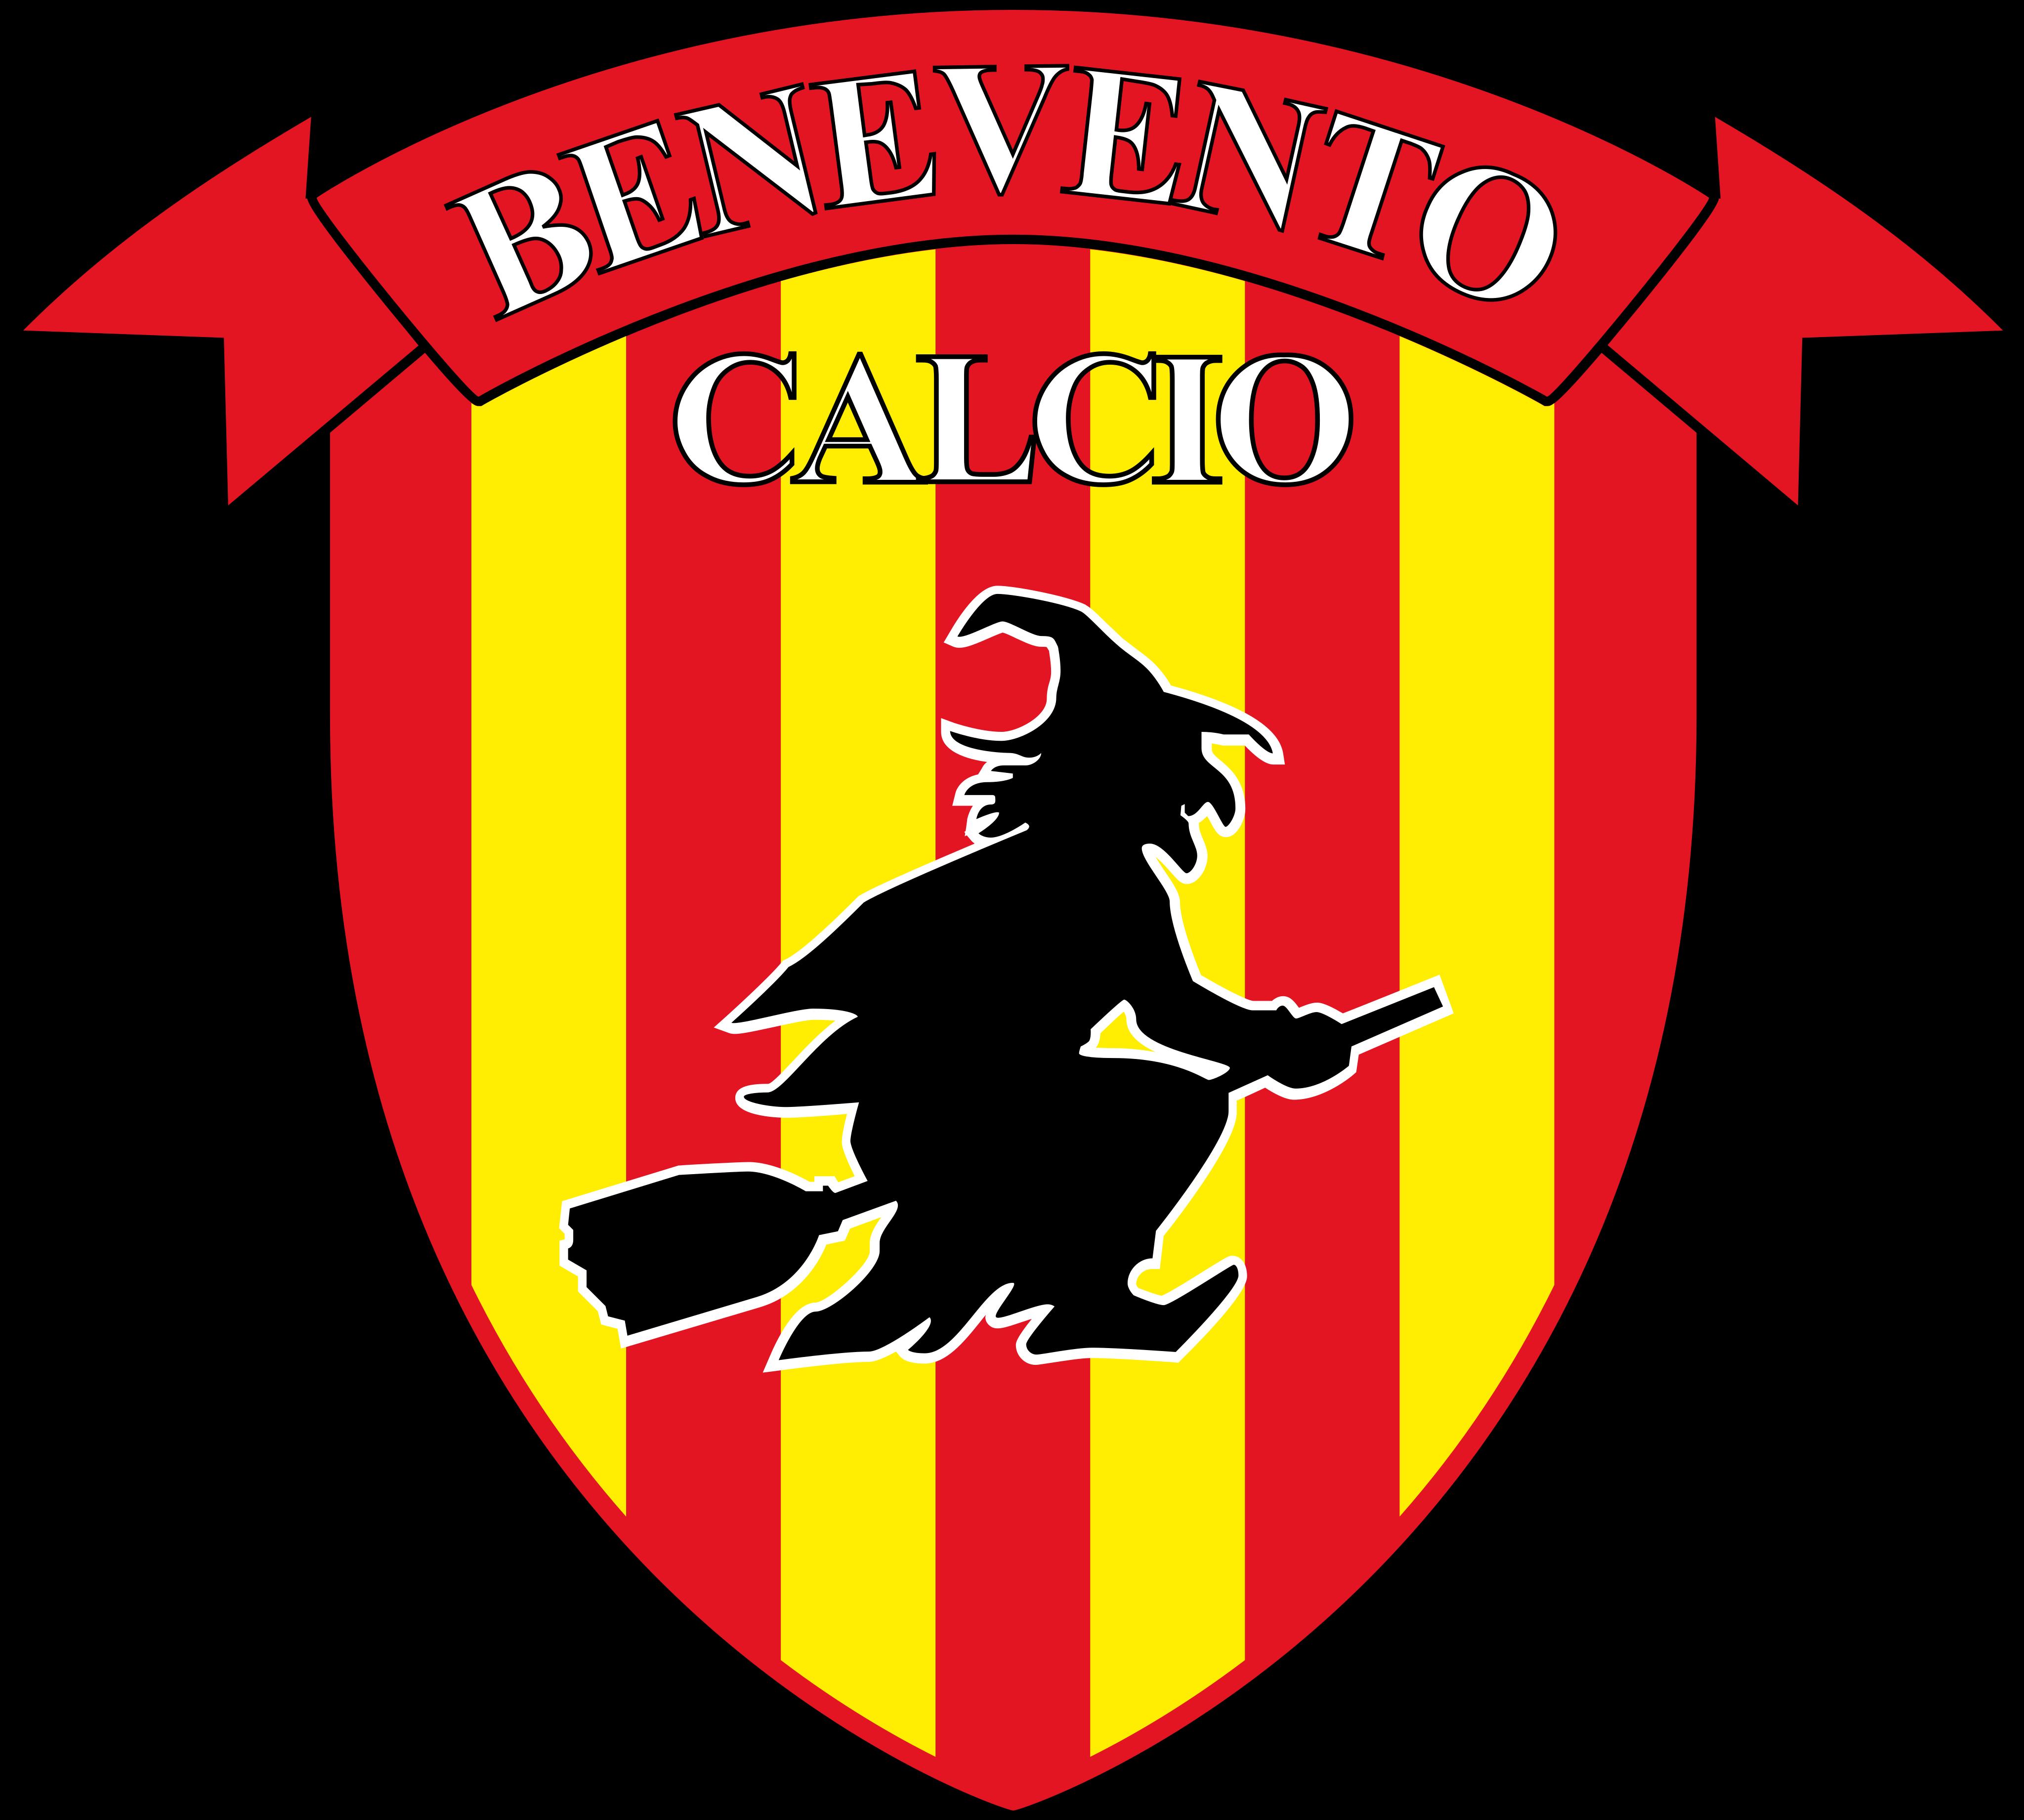 benevento calcio logo - Benevento Calcio Logo